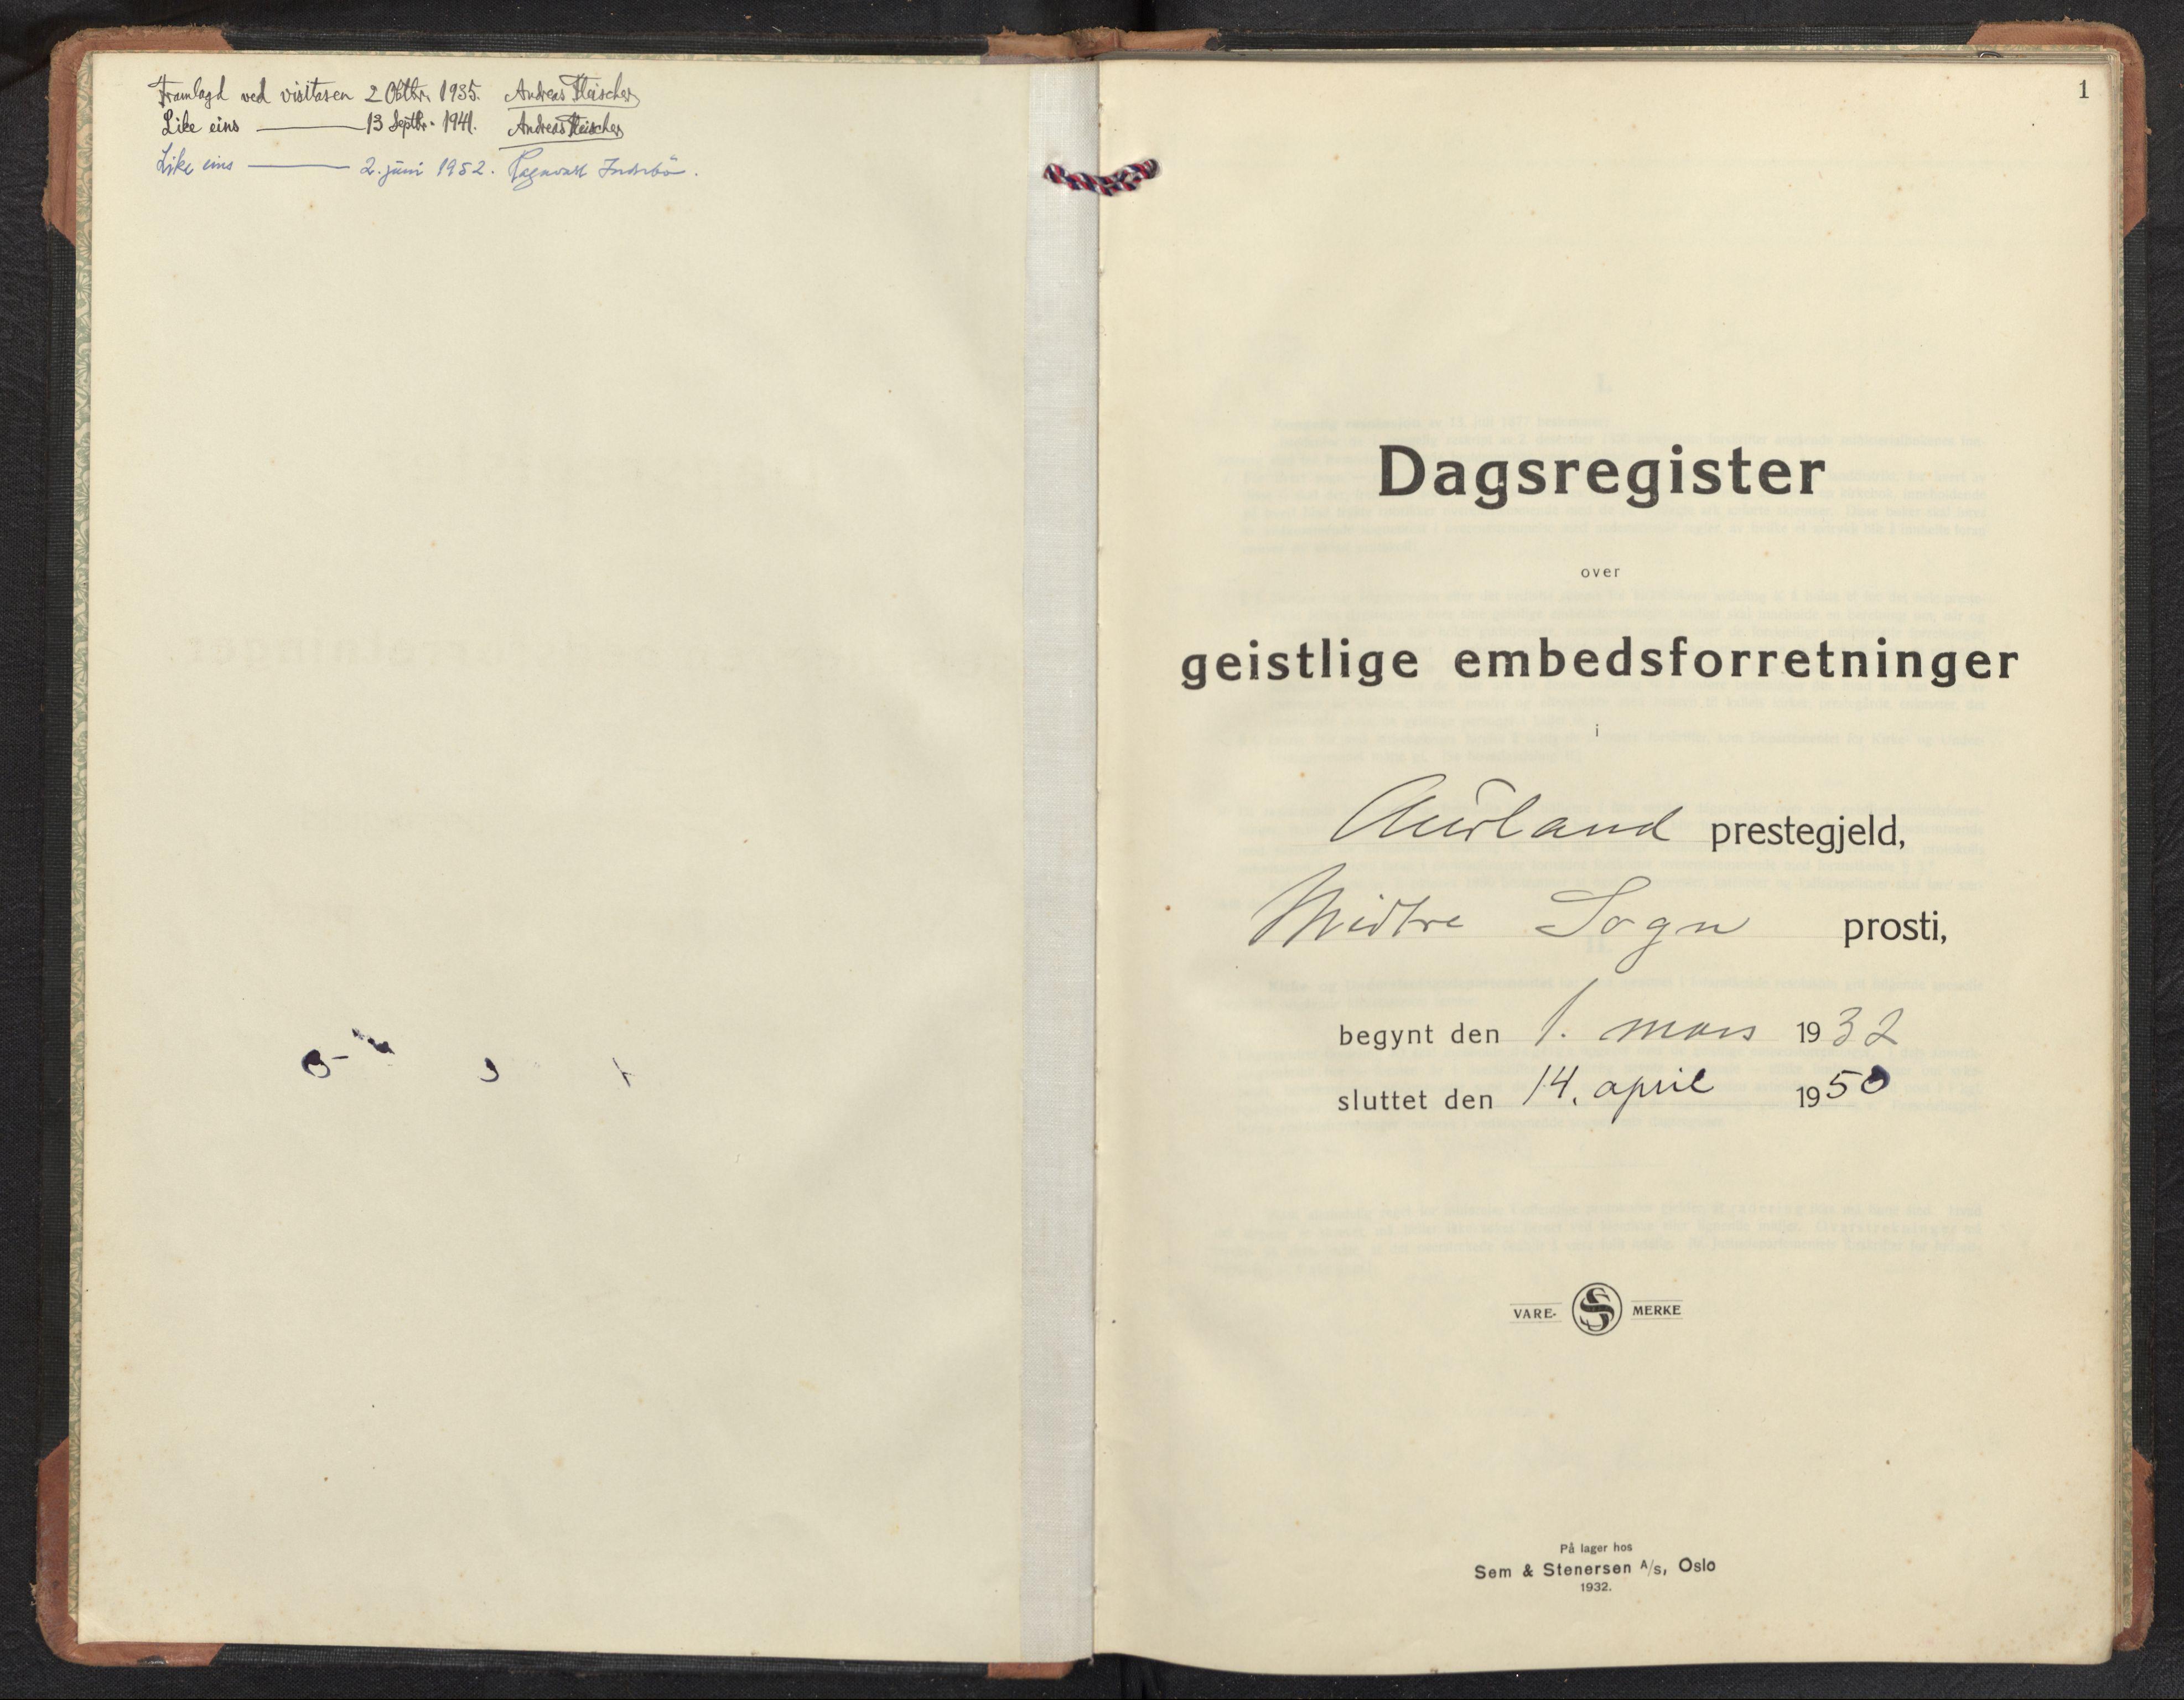 SAB, Aurland Sokneprestembete*, Diary records no. F 3, 1932-1950, p. 0b-1a